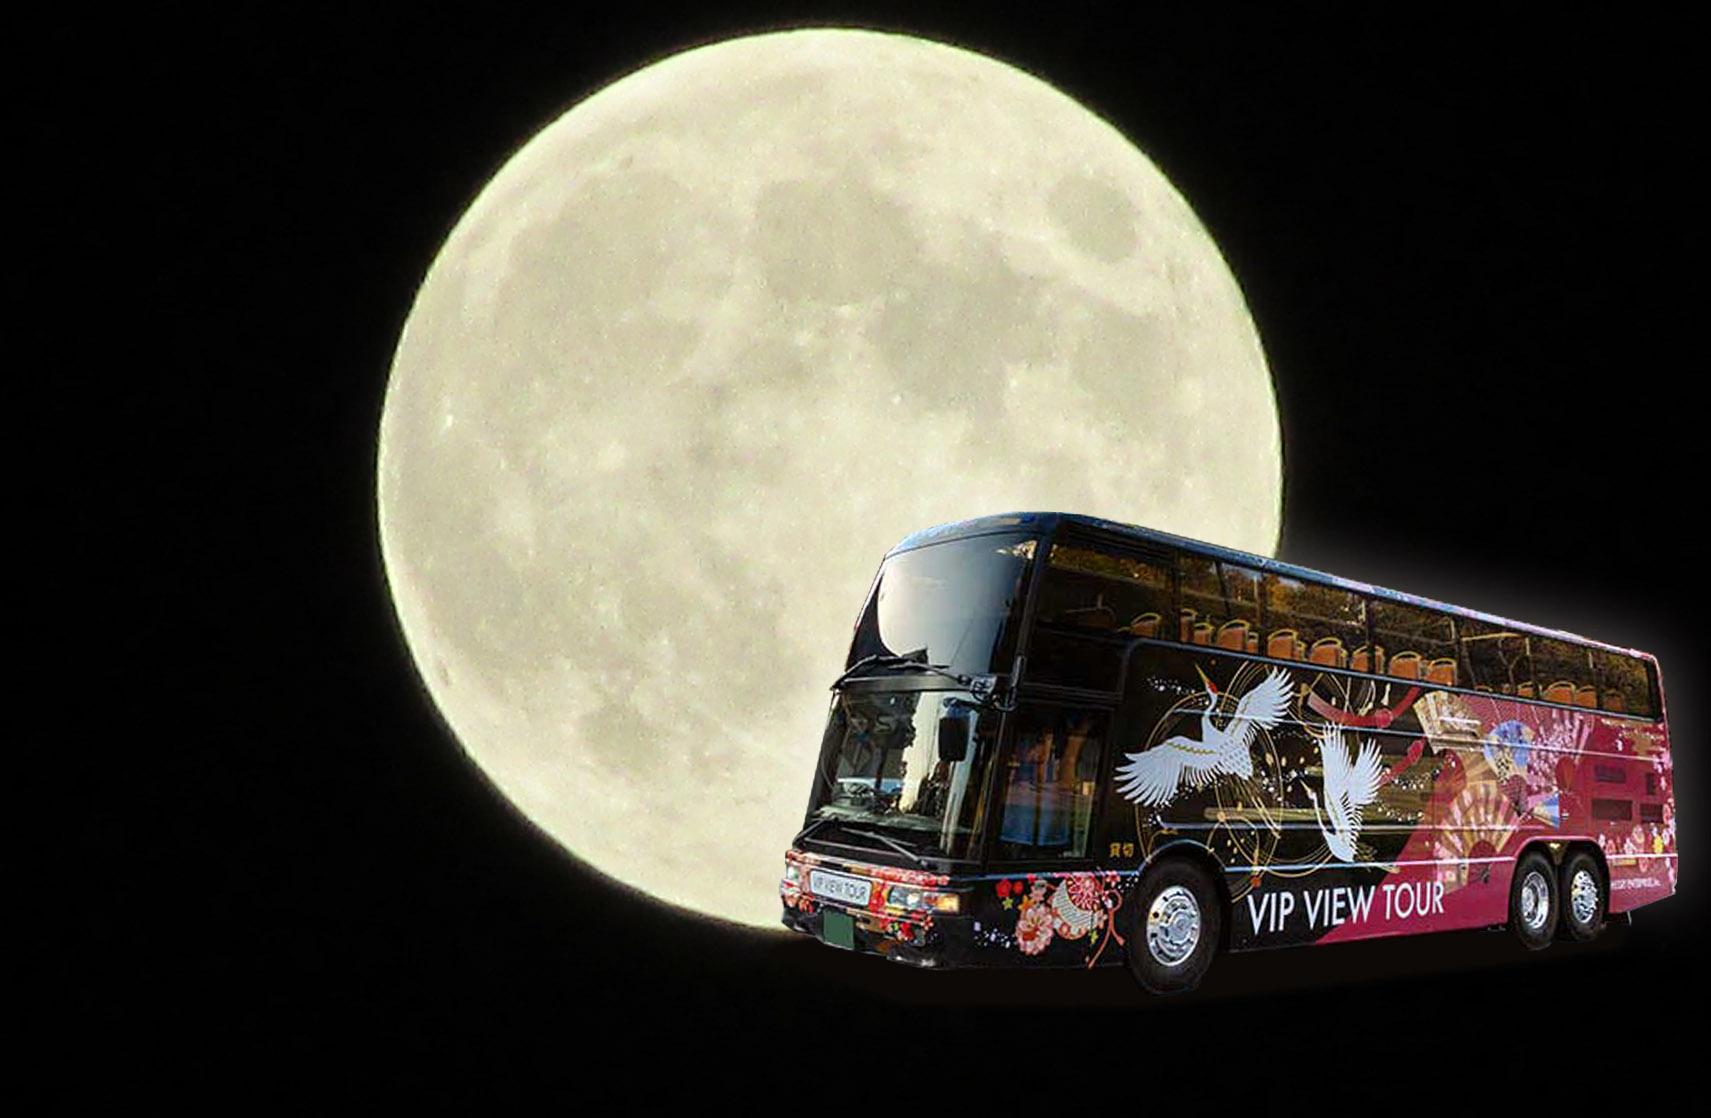 <GoToトラベル対象商品>オープントップバス日本古来の十三夜を眺める「お月見バスツアー」<70分コース>